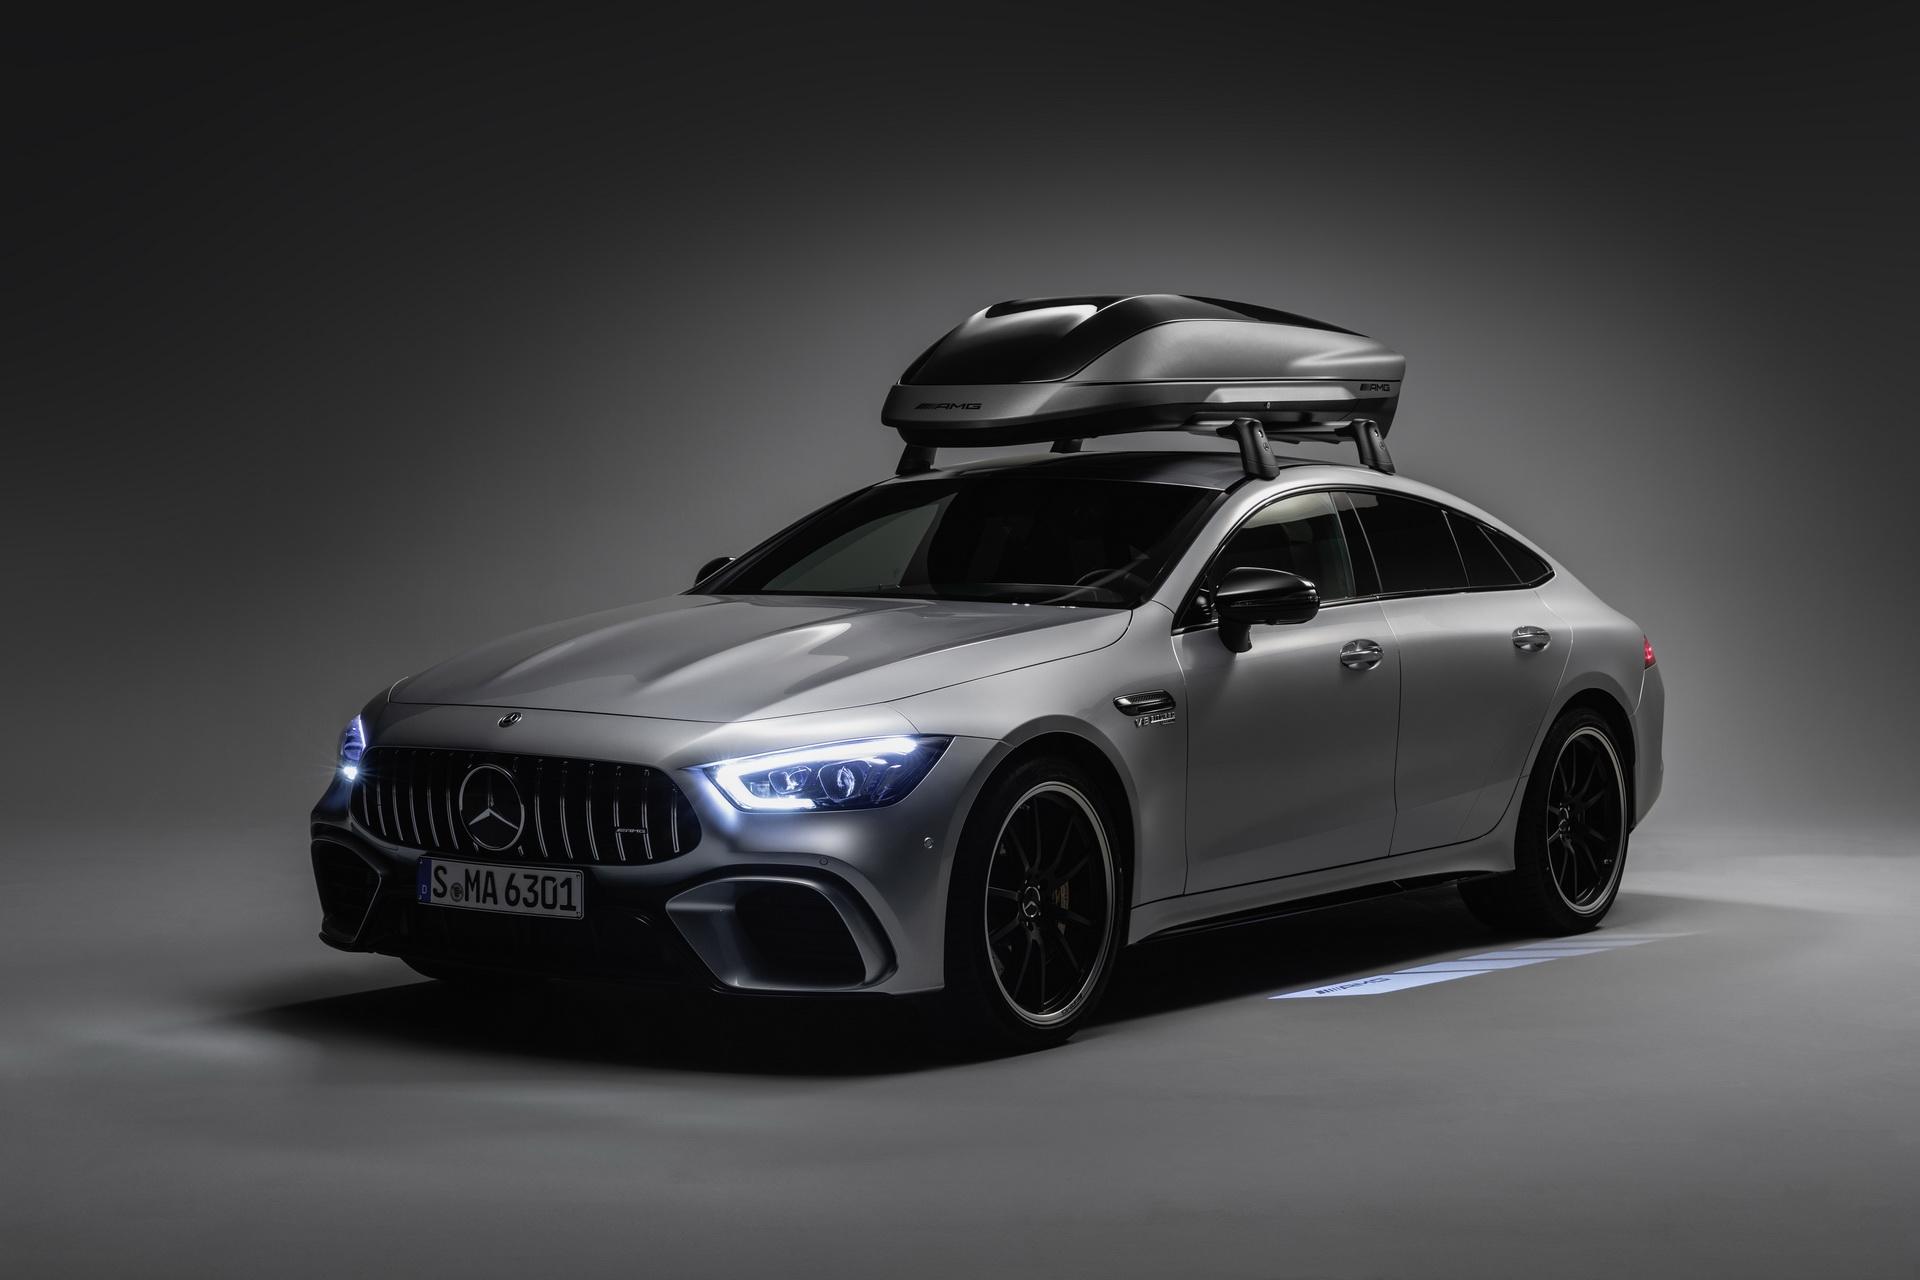 Mercedes-AMG box da tetto